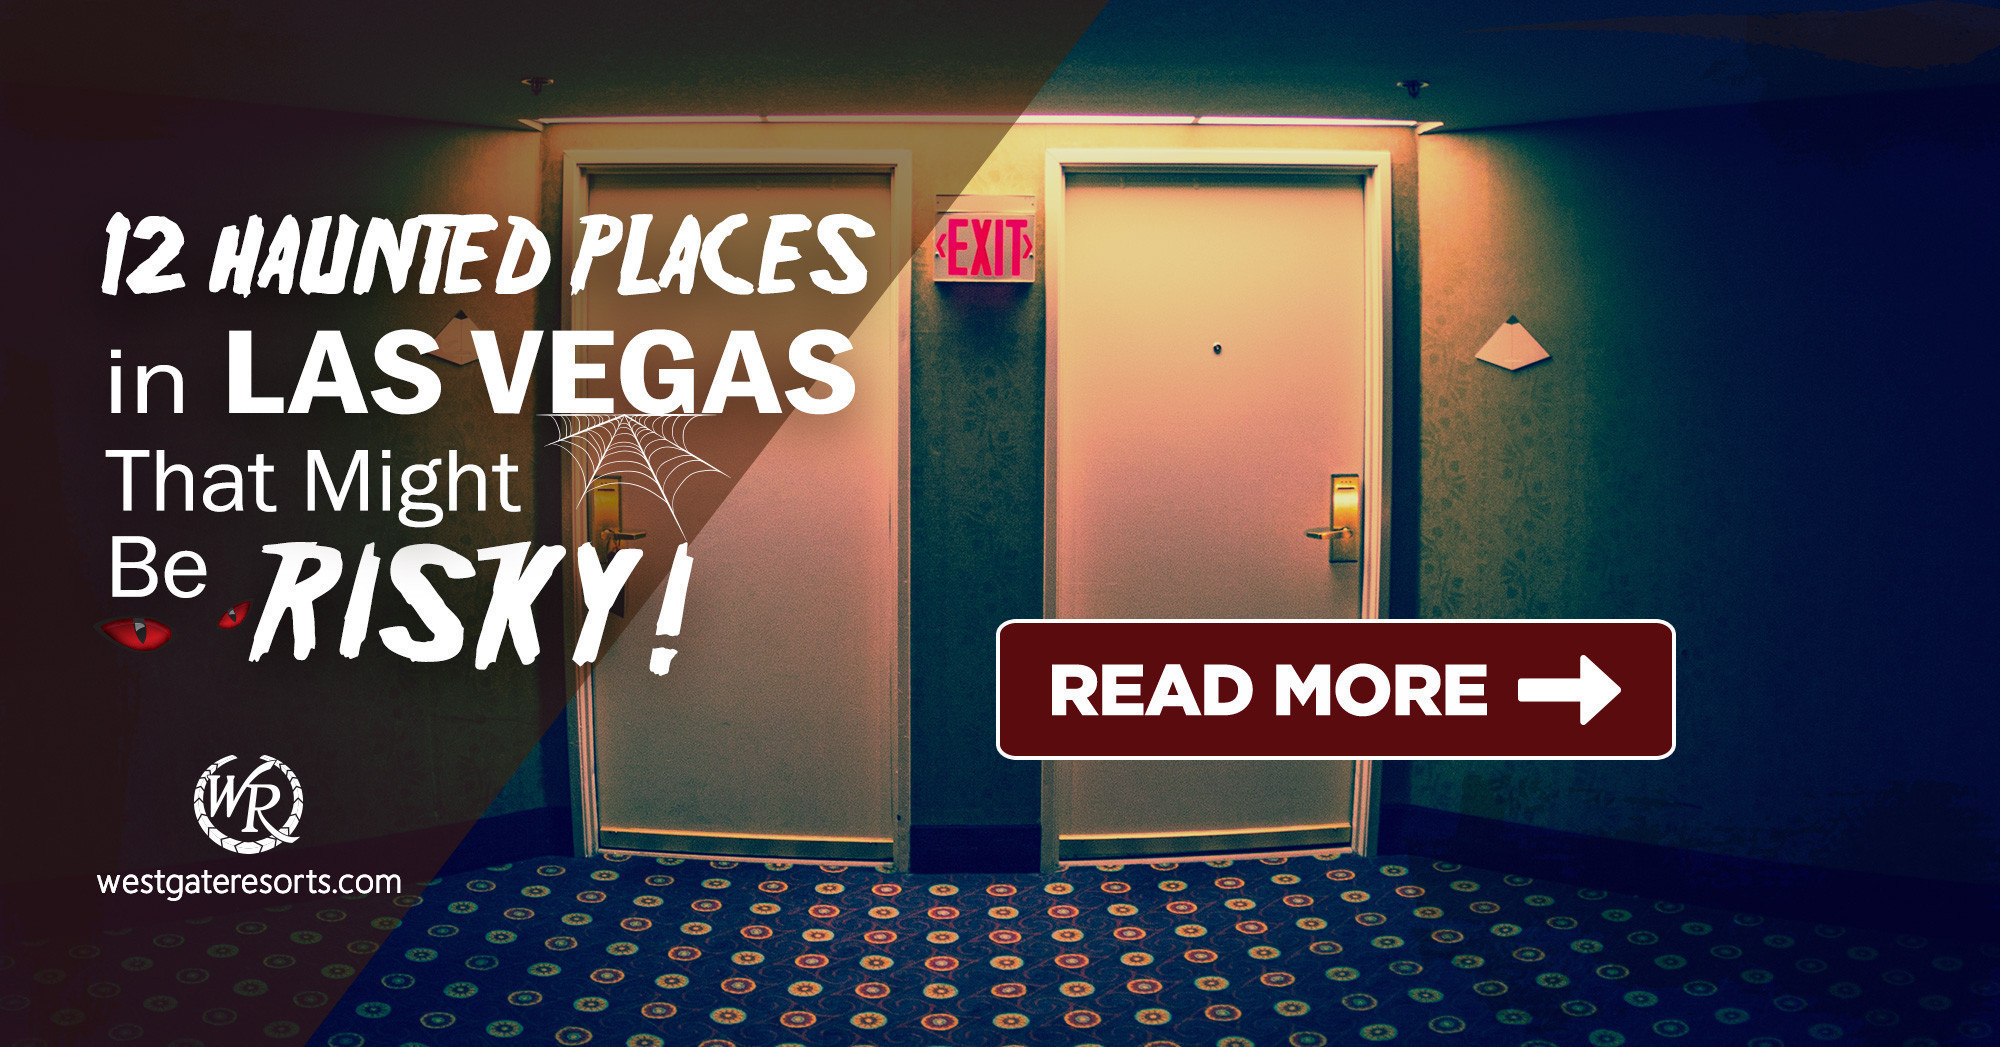 12 Haunted Places in Las Vegas | Westgate Resorts Travel Blog